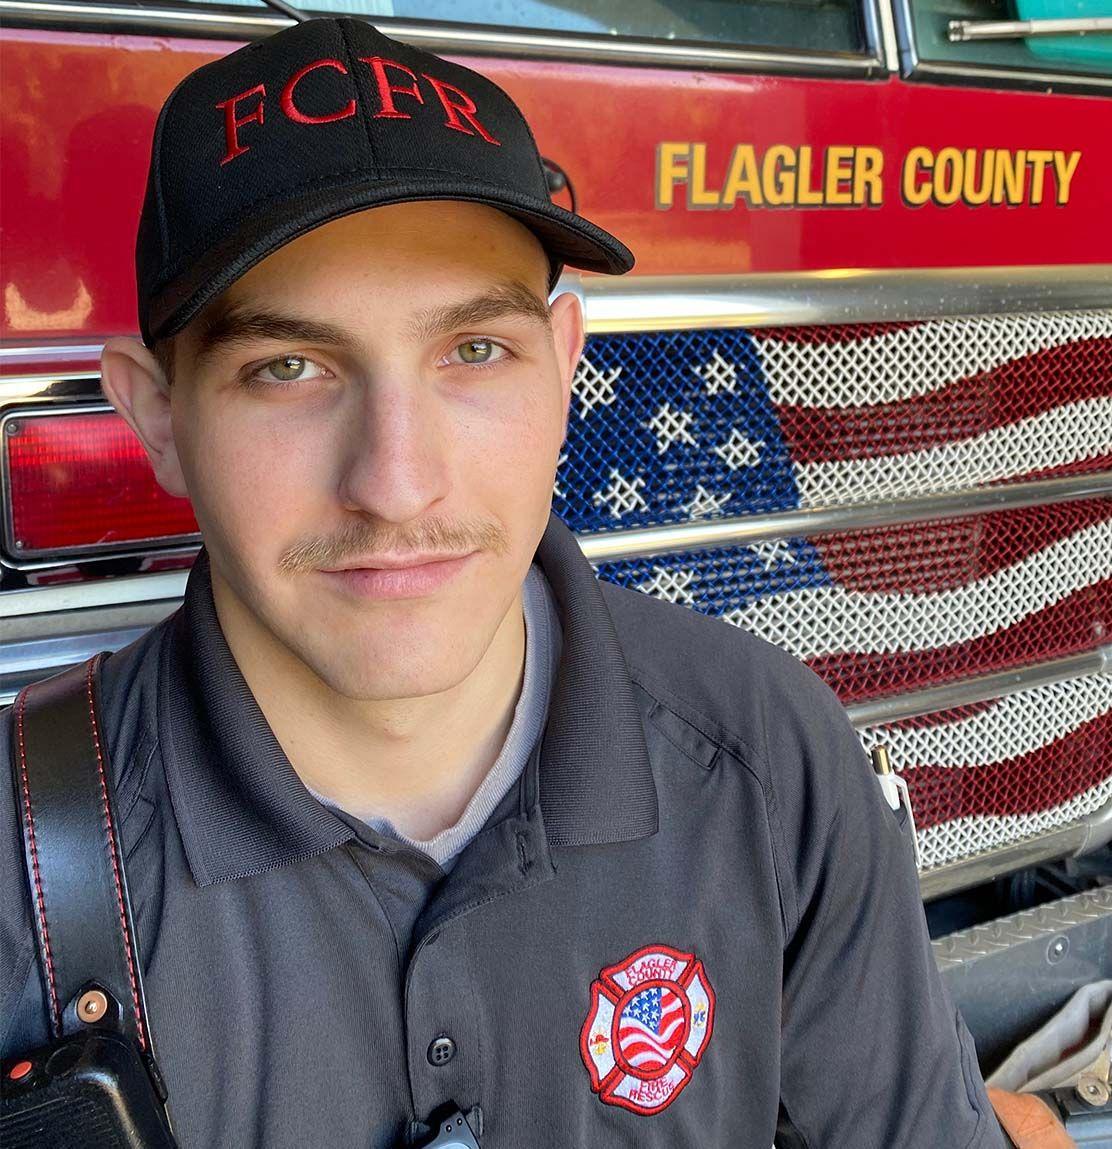 Noah Dunaway, 2019 FPC Fire Leadership Graduate